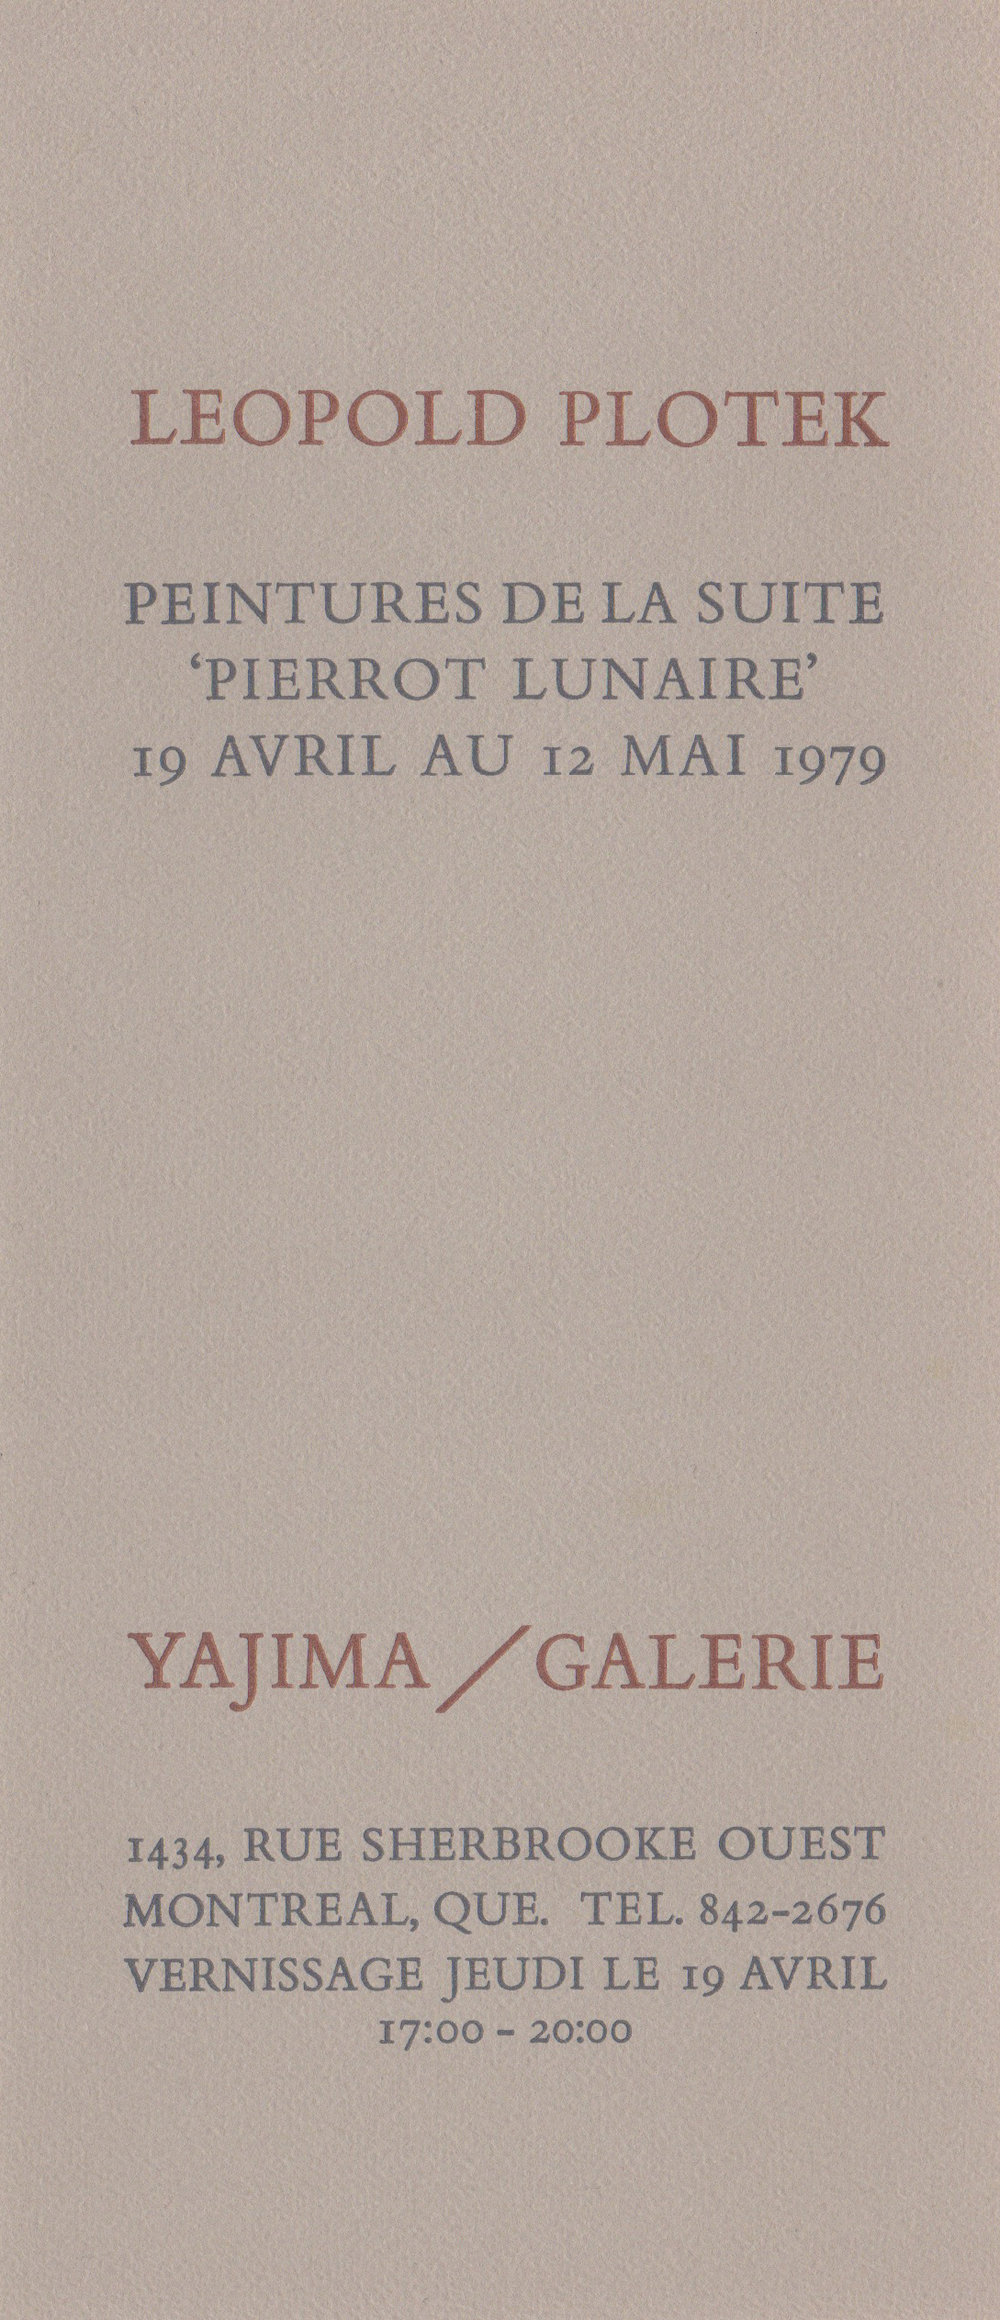 Yajima/Galerie, Montreal, Canada, 1979 (solo)